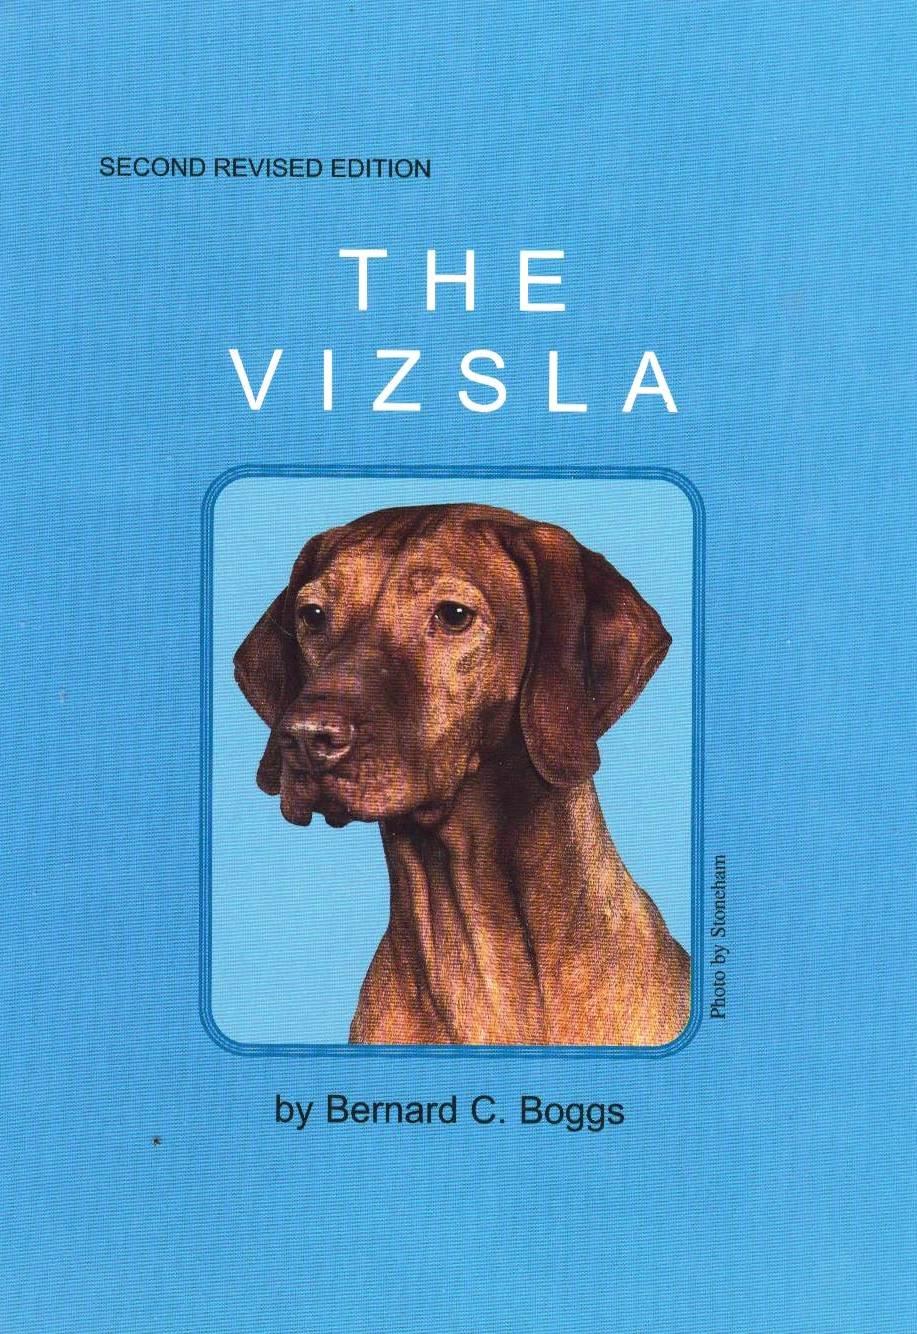 The vizsla b c boggs 9780960883806 amazon books nvjuhfo Images